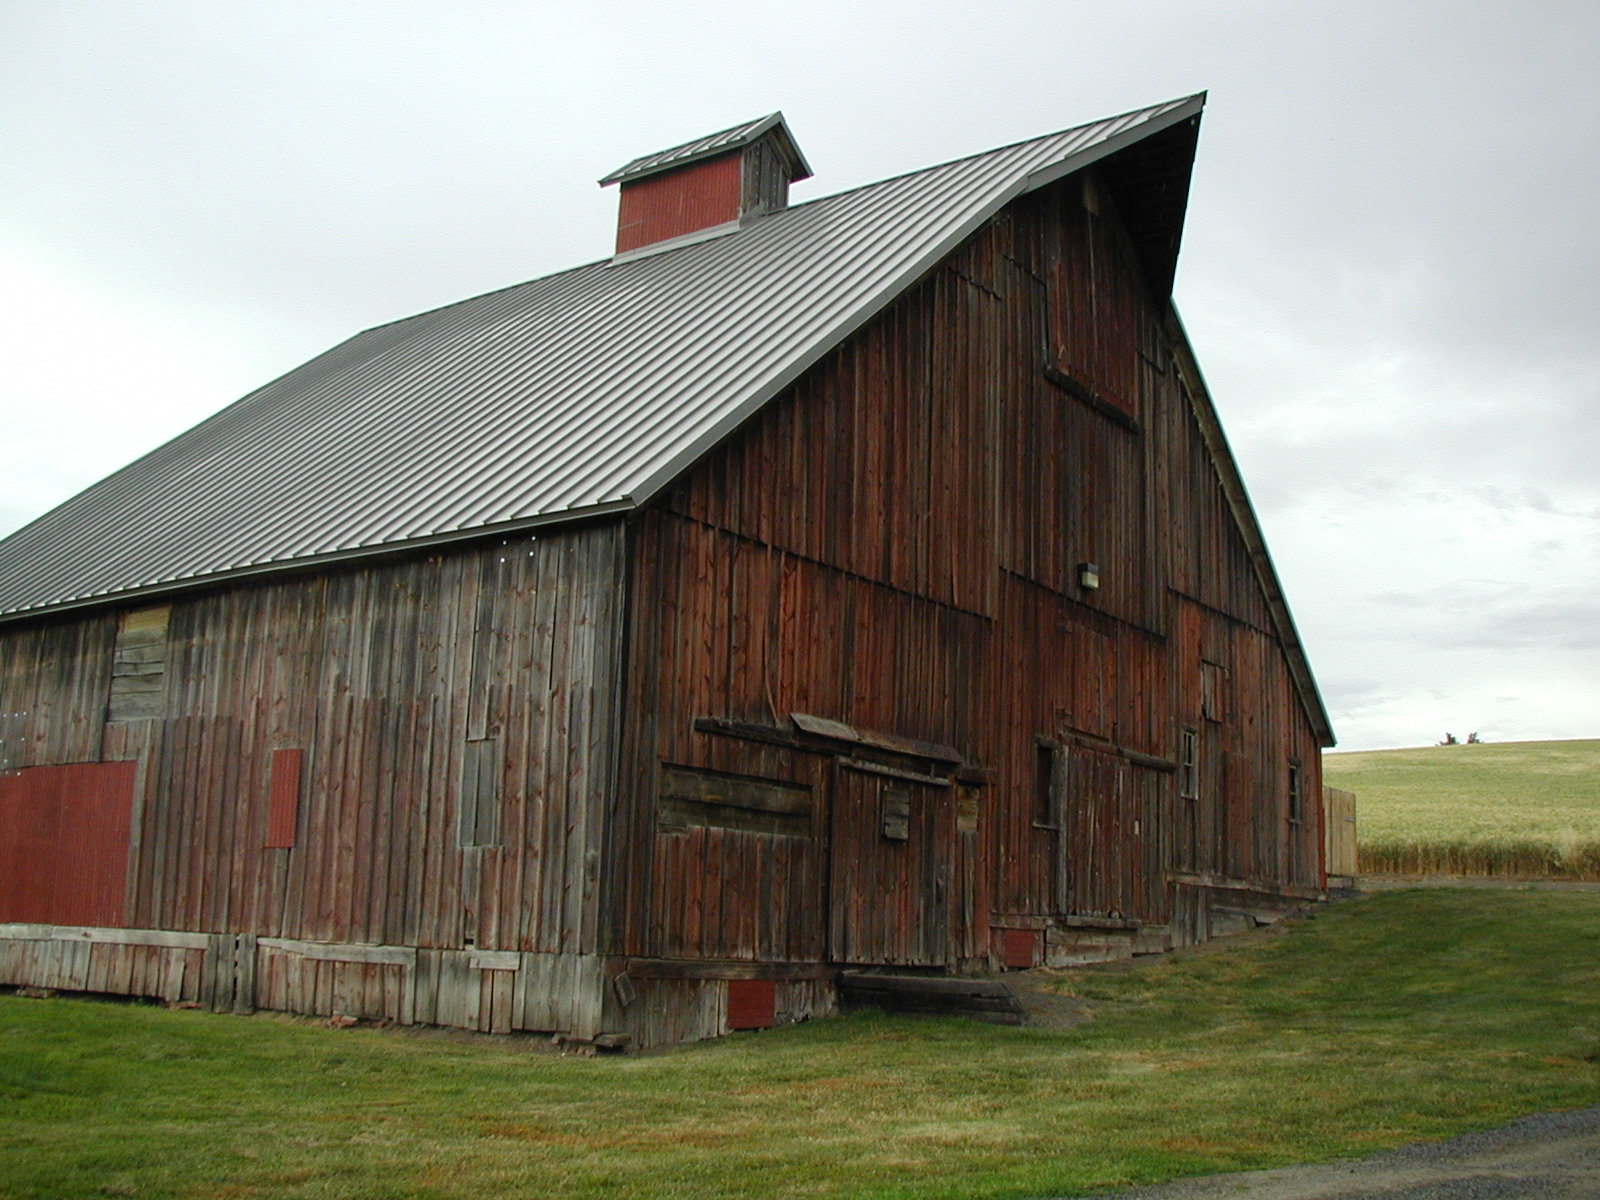 A Big Red Barn